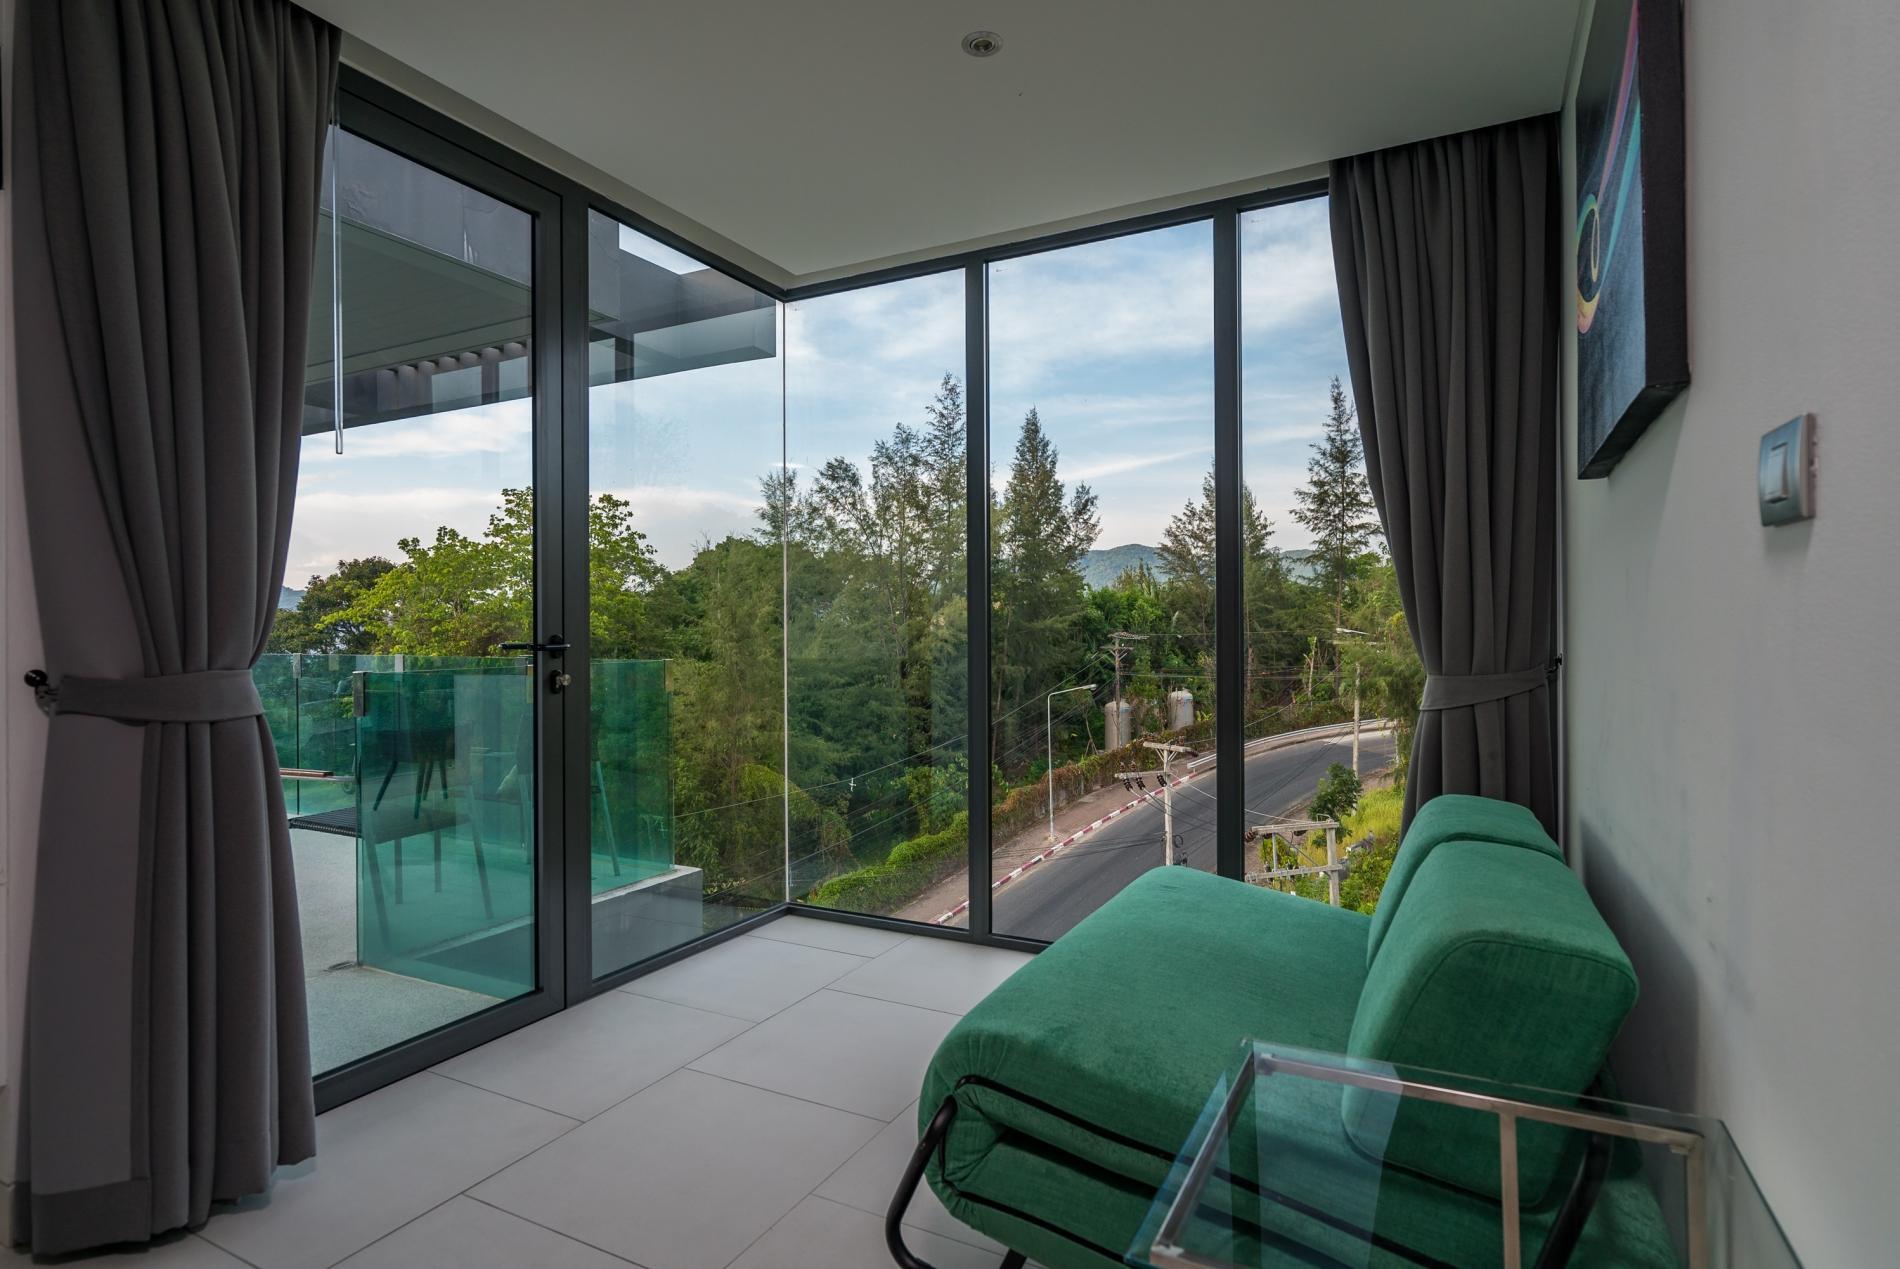 Apartment Twin Sands 1406 - Panoramic seaview apartment walk to beach  shared pool photo 17053748